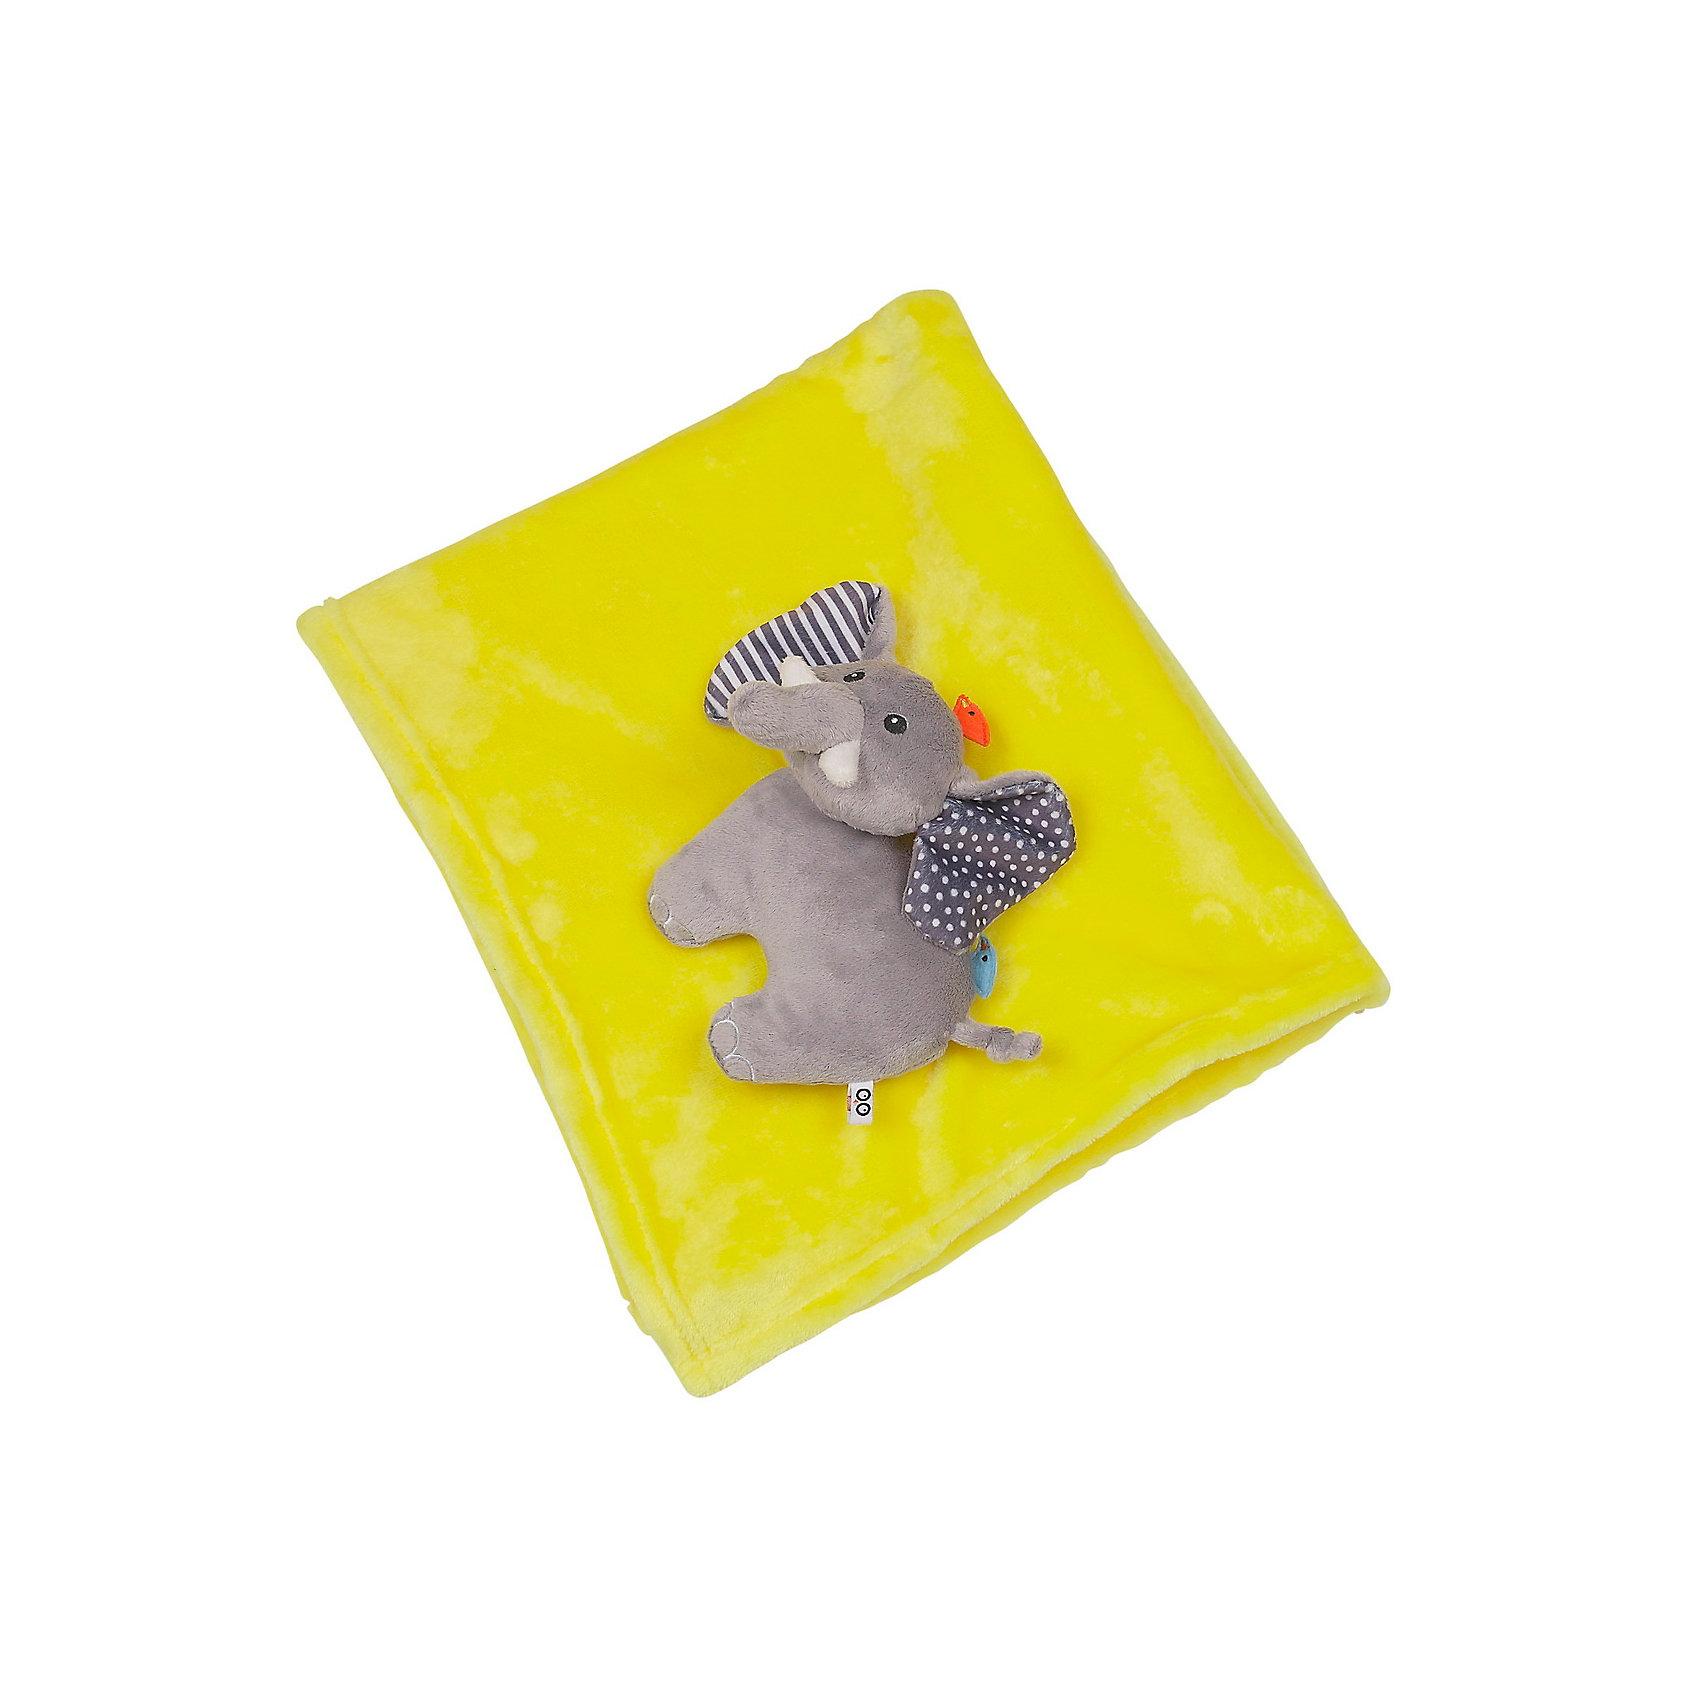 Zoocchini Одеяло с игрушкой Слон, Zoocchini, жёлтый